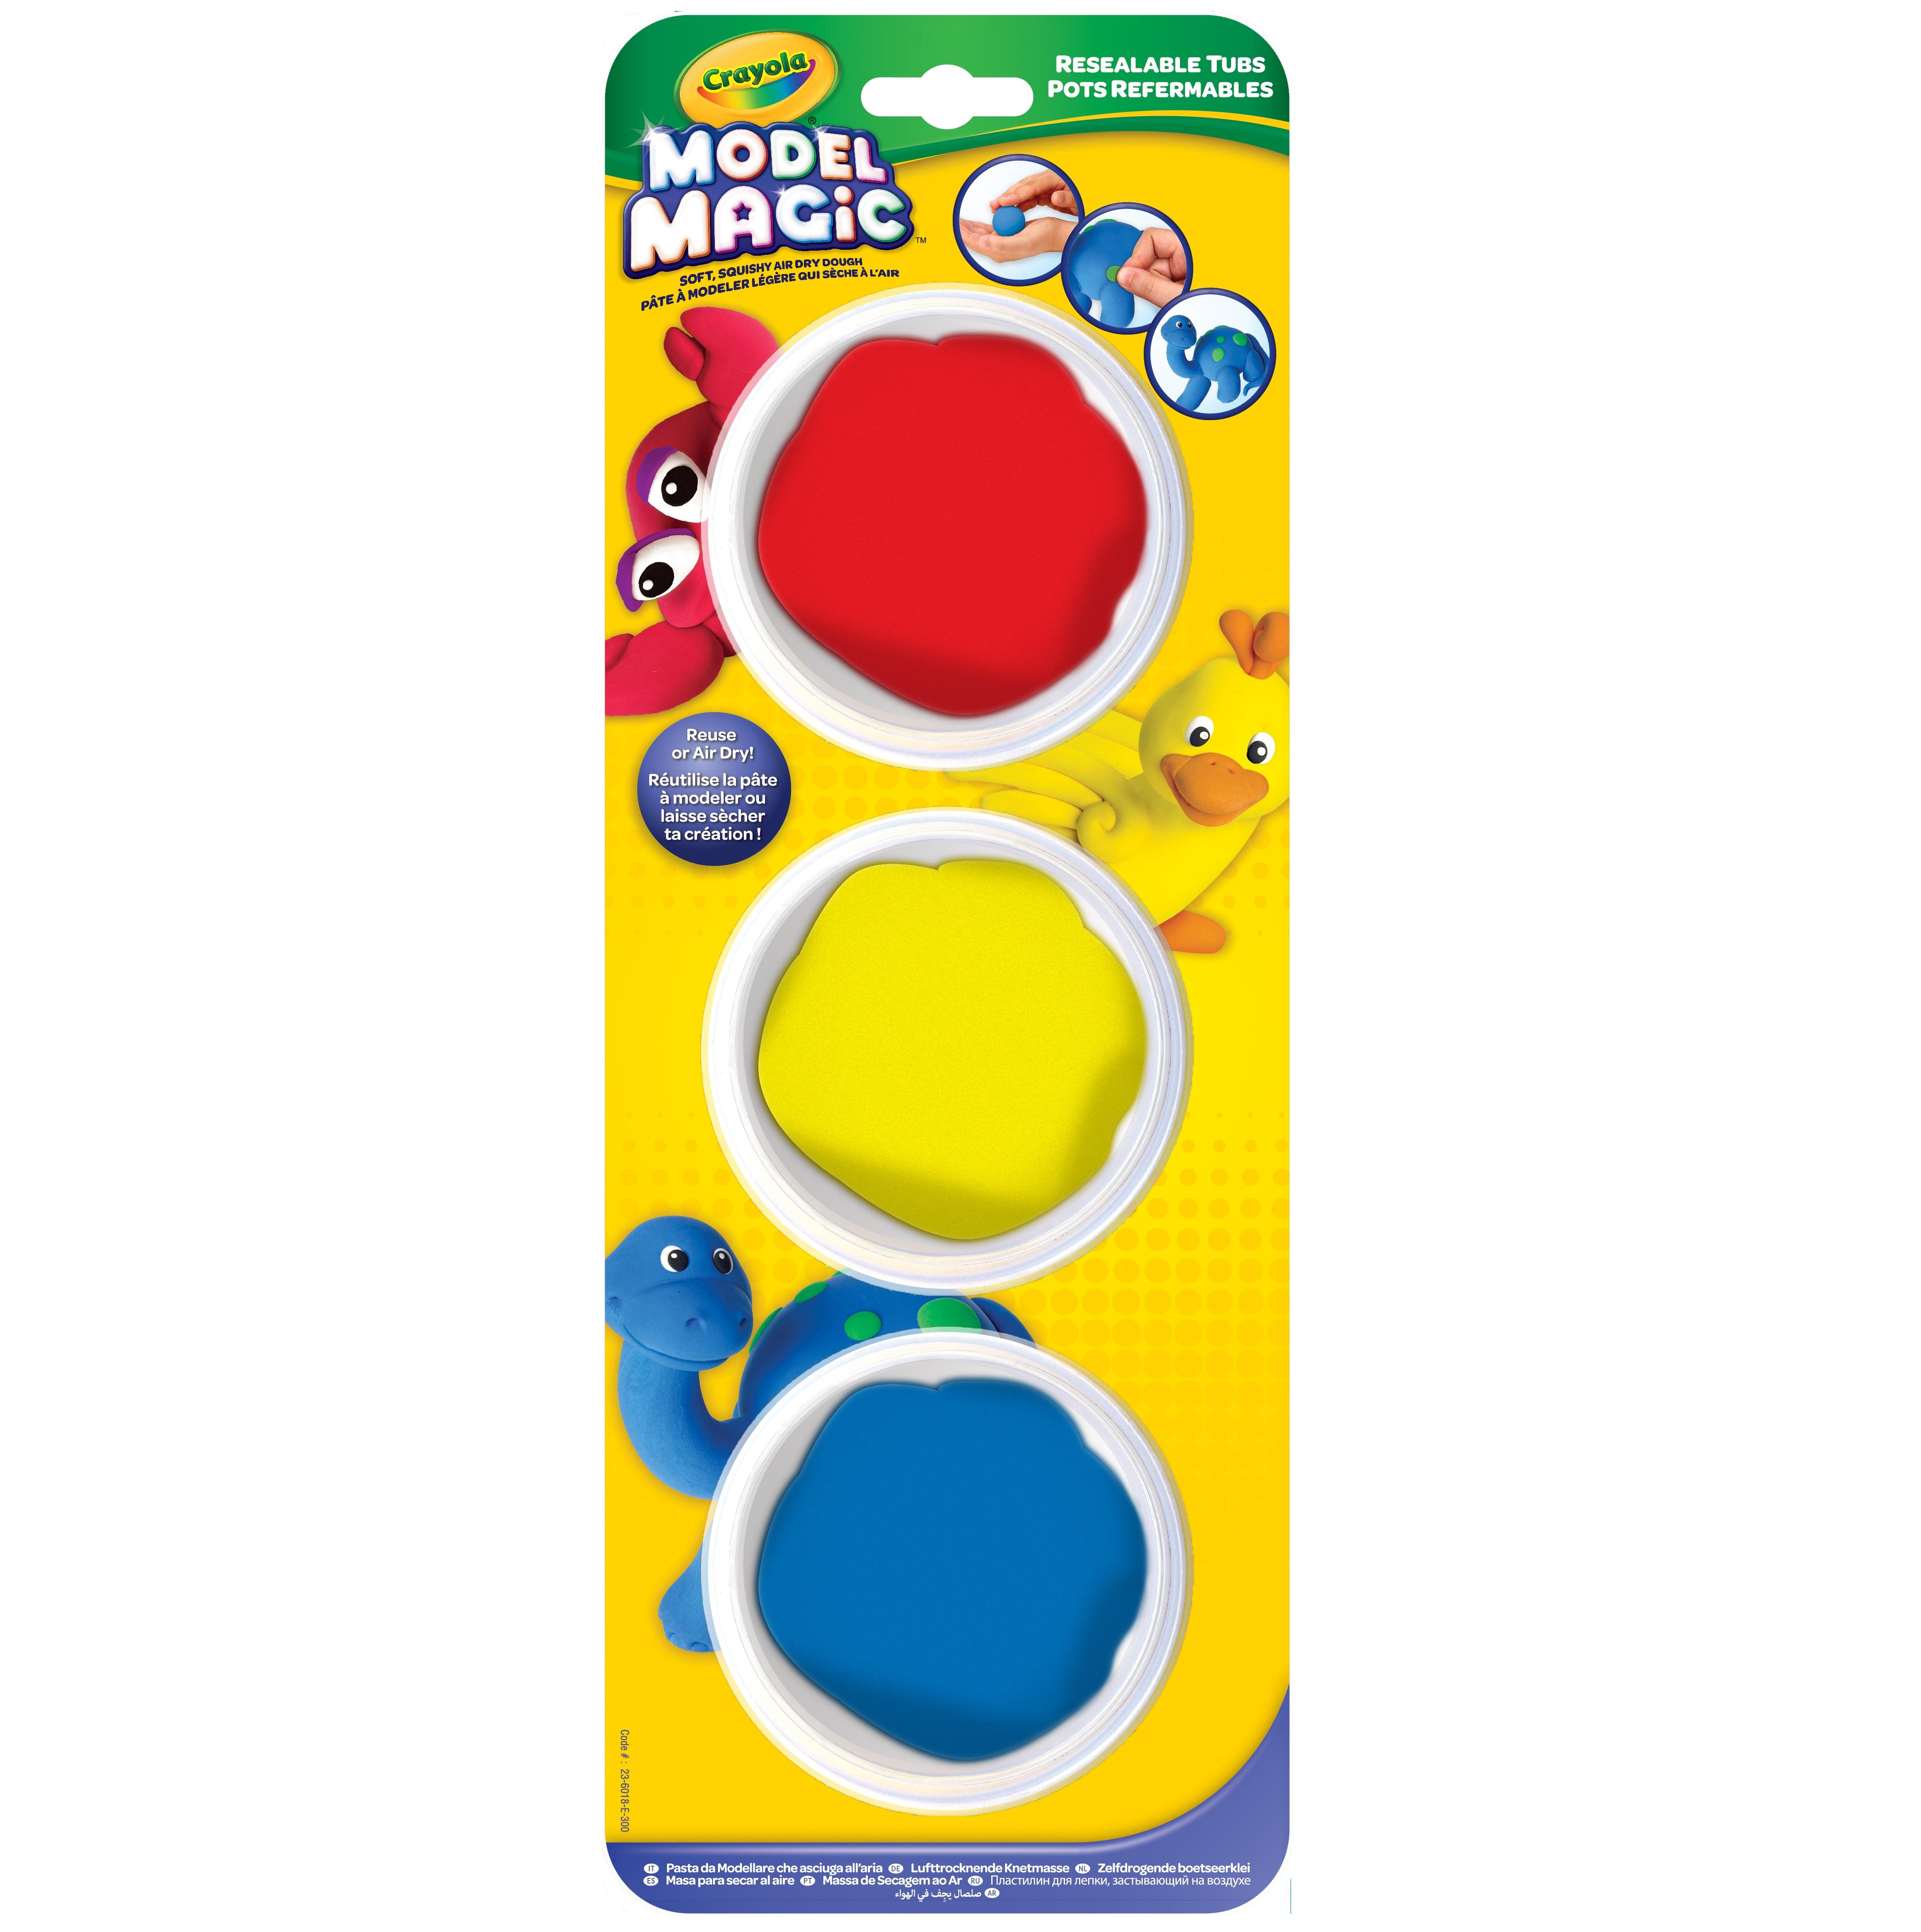 Crayola Model Magic, Primary Colors, 3 - 2.25 oz (63 g) jars [6.75 oz (191 g)]